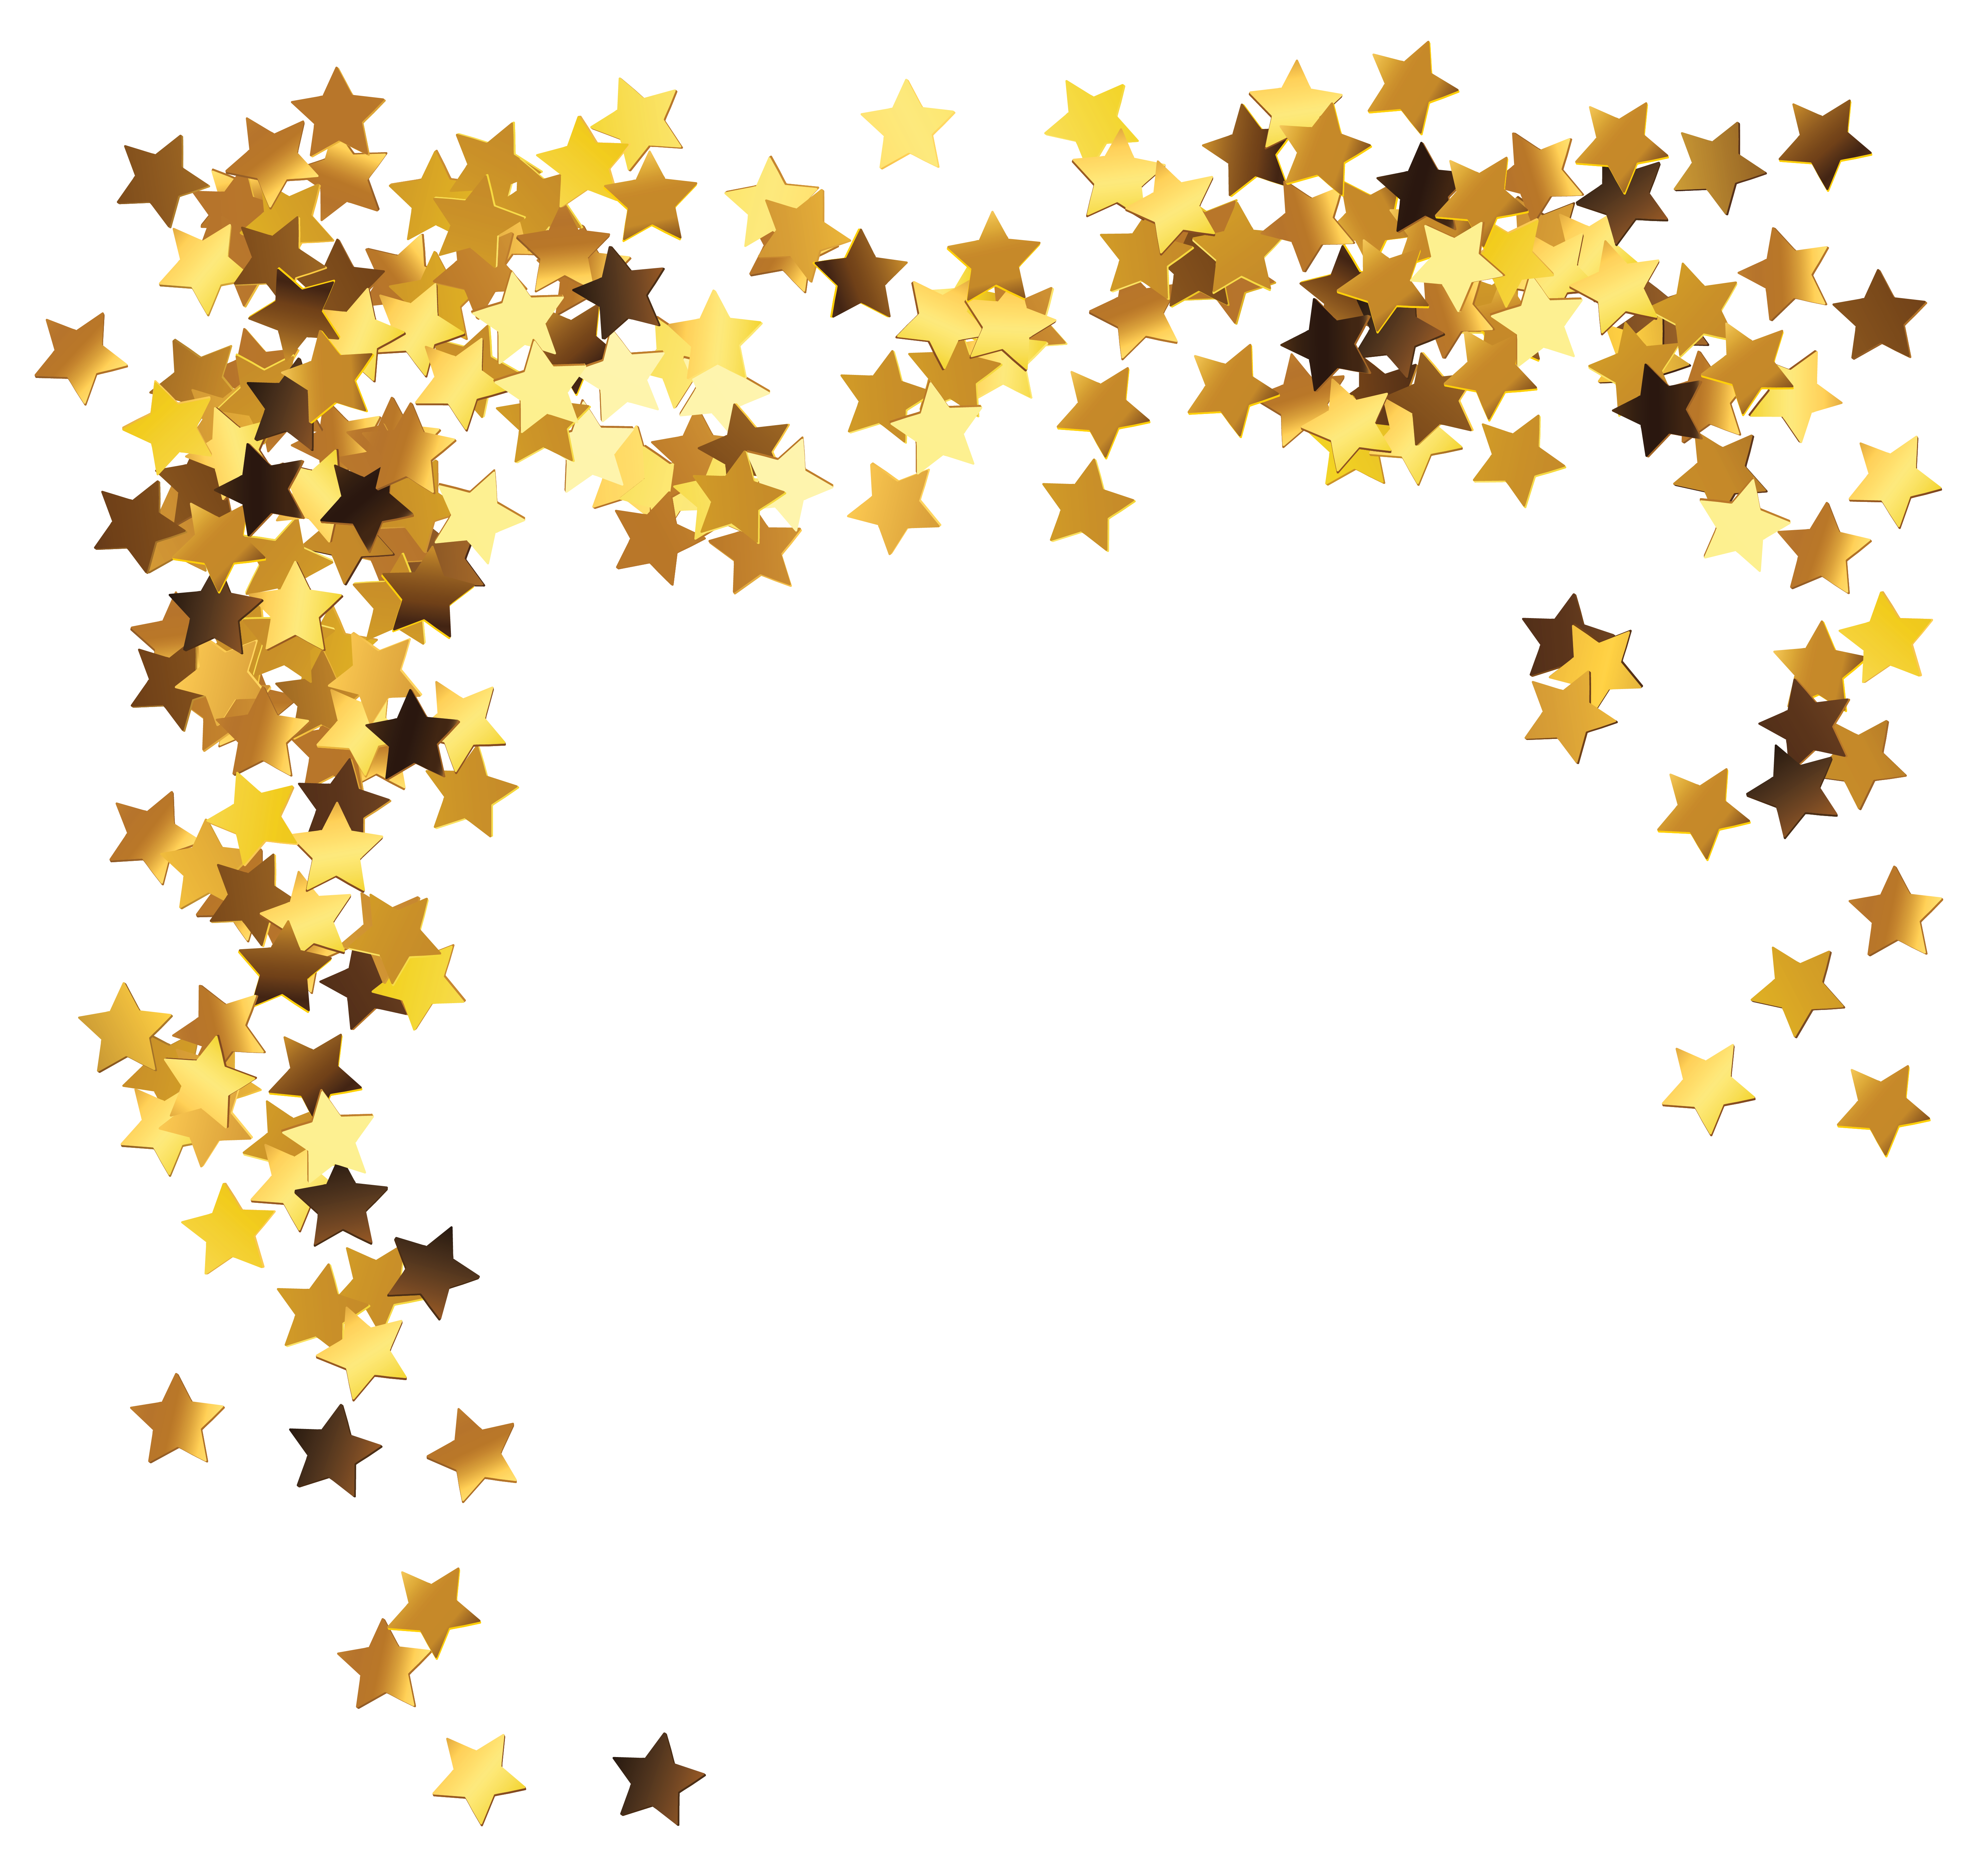 Star Clip Art Outline Free Clipart Images 4 Clipartix Star Background Clip Art Borders Overlays Transparent